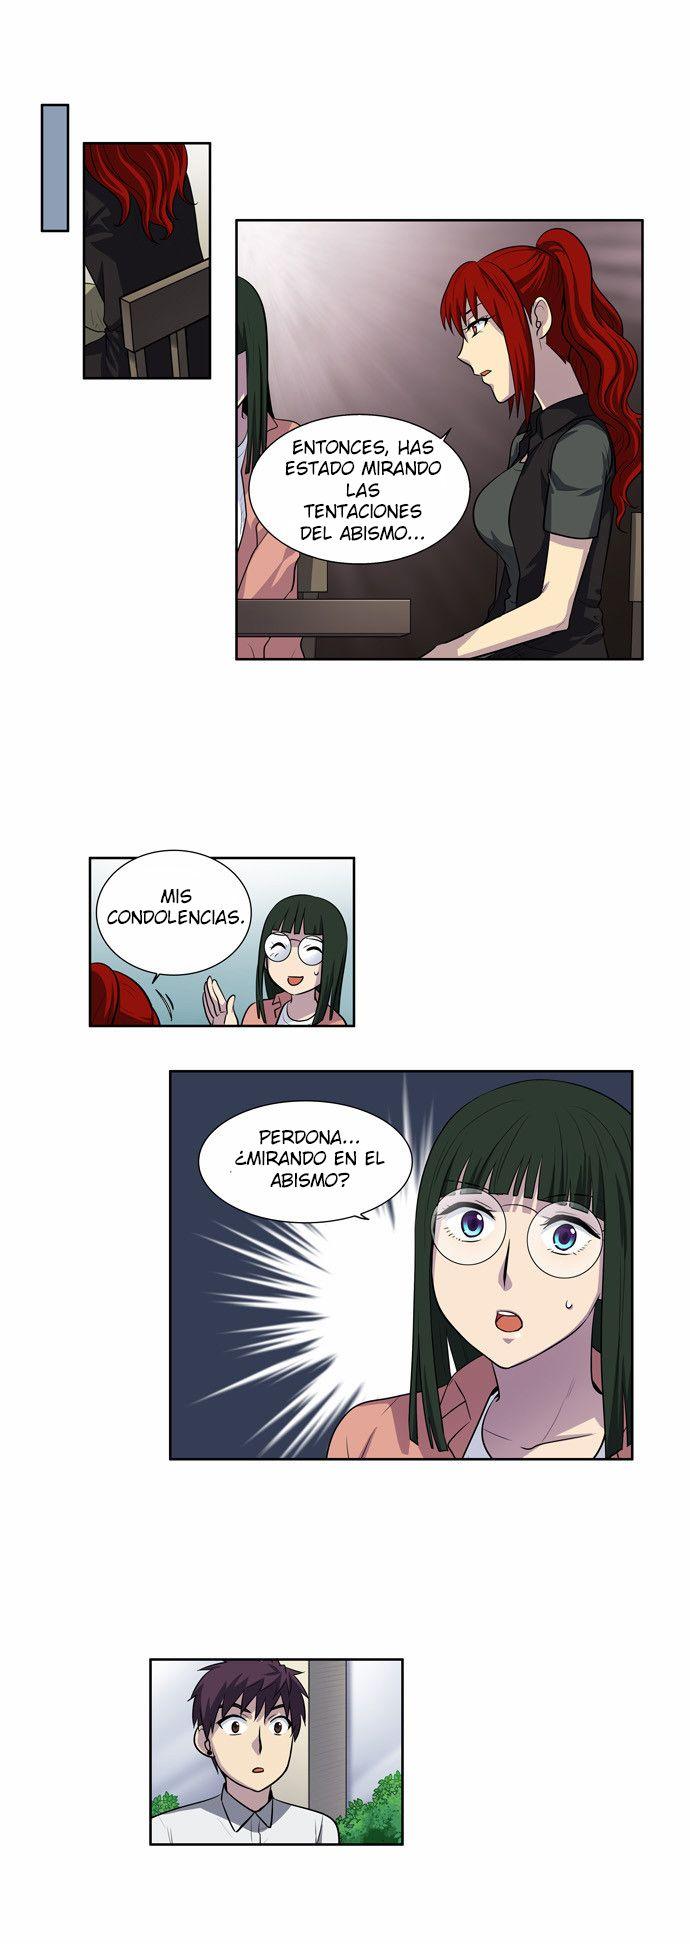 https://c5.ninemanga.com/es_manga/61/1725/476787/bb5e4f2974573e970a73419f0a5f7f41.jpg Page 4